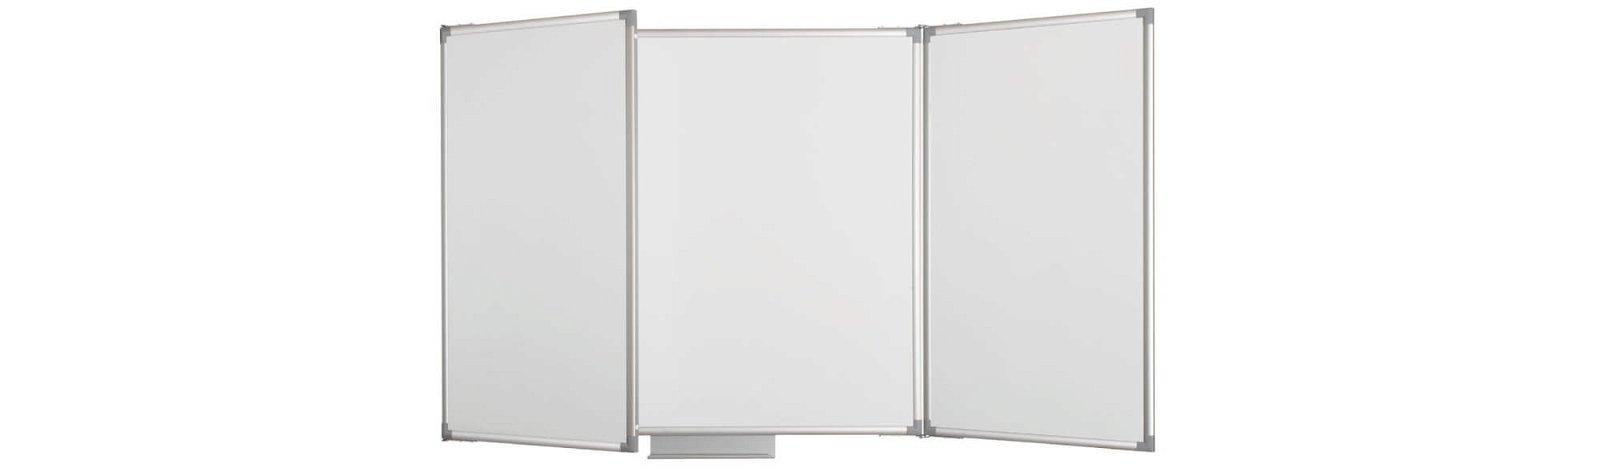 Whiteboard Klapptafel MAULpro, 100x150 cm, grau